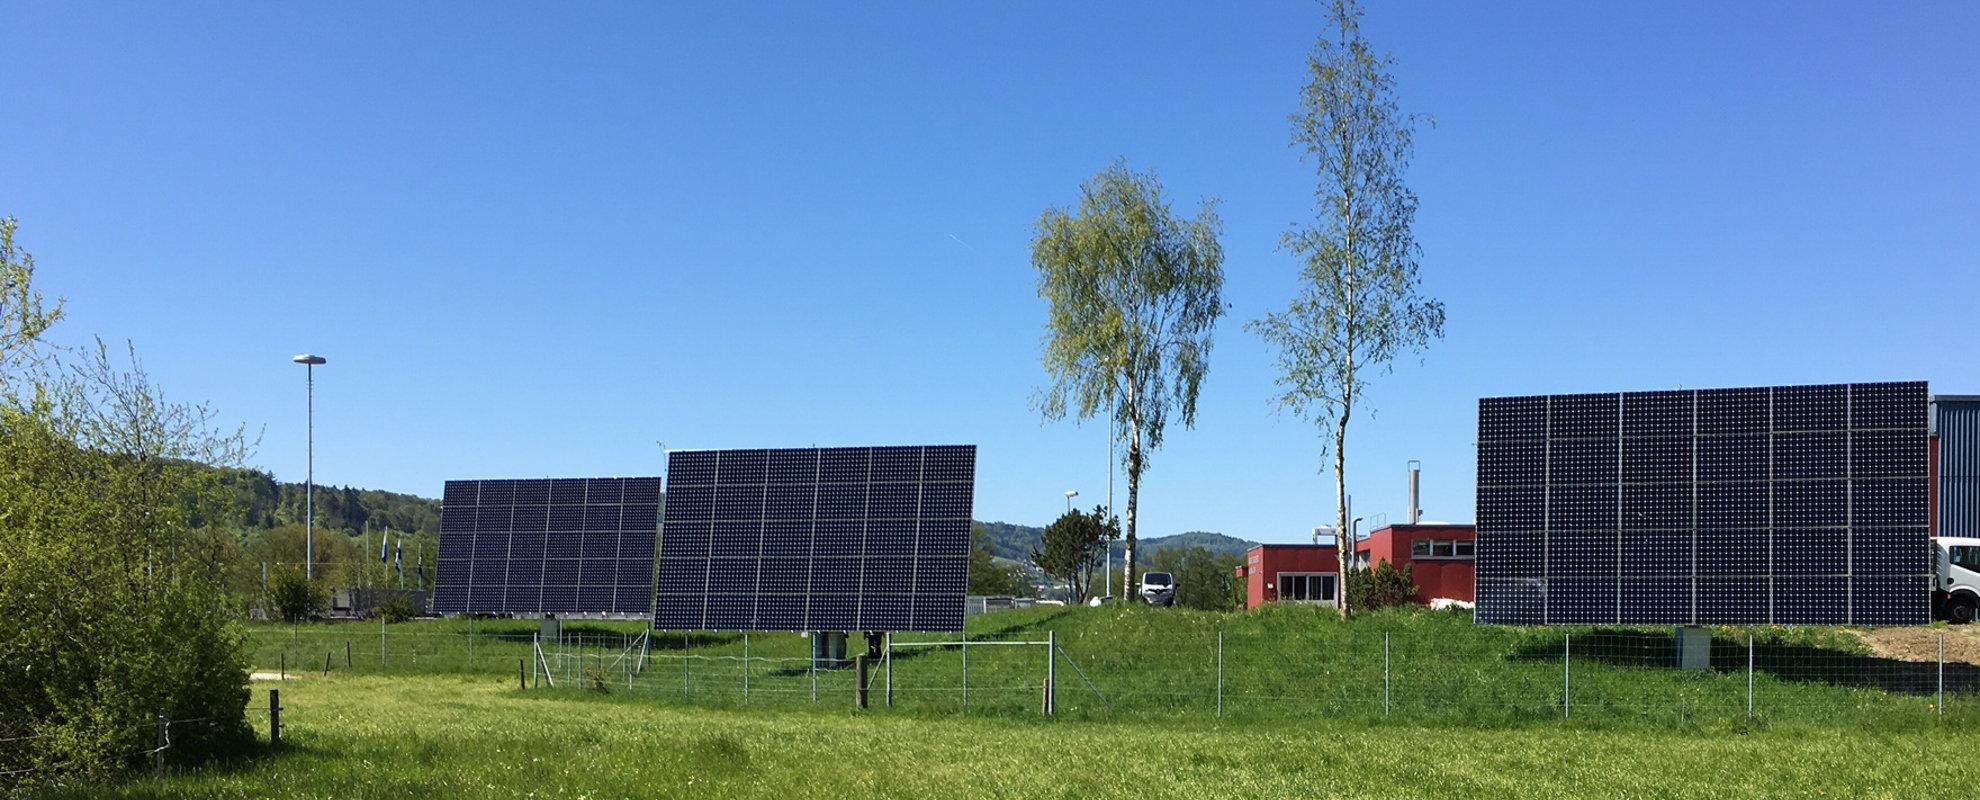 myCleantechSolarTracker™ Solaranalage - Wohngebiet